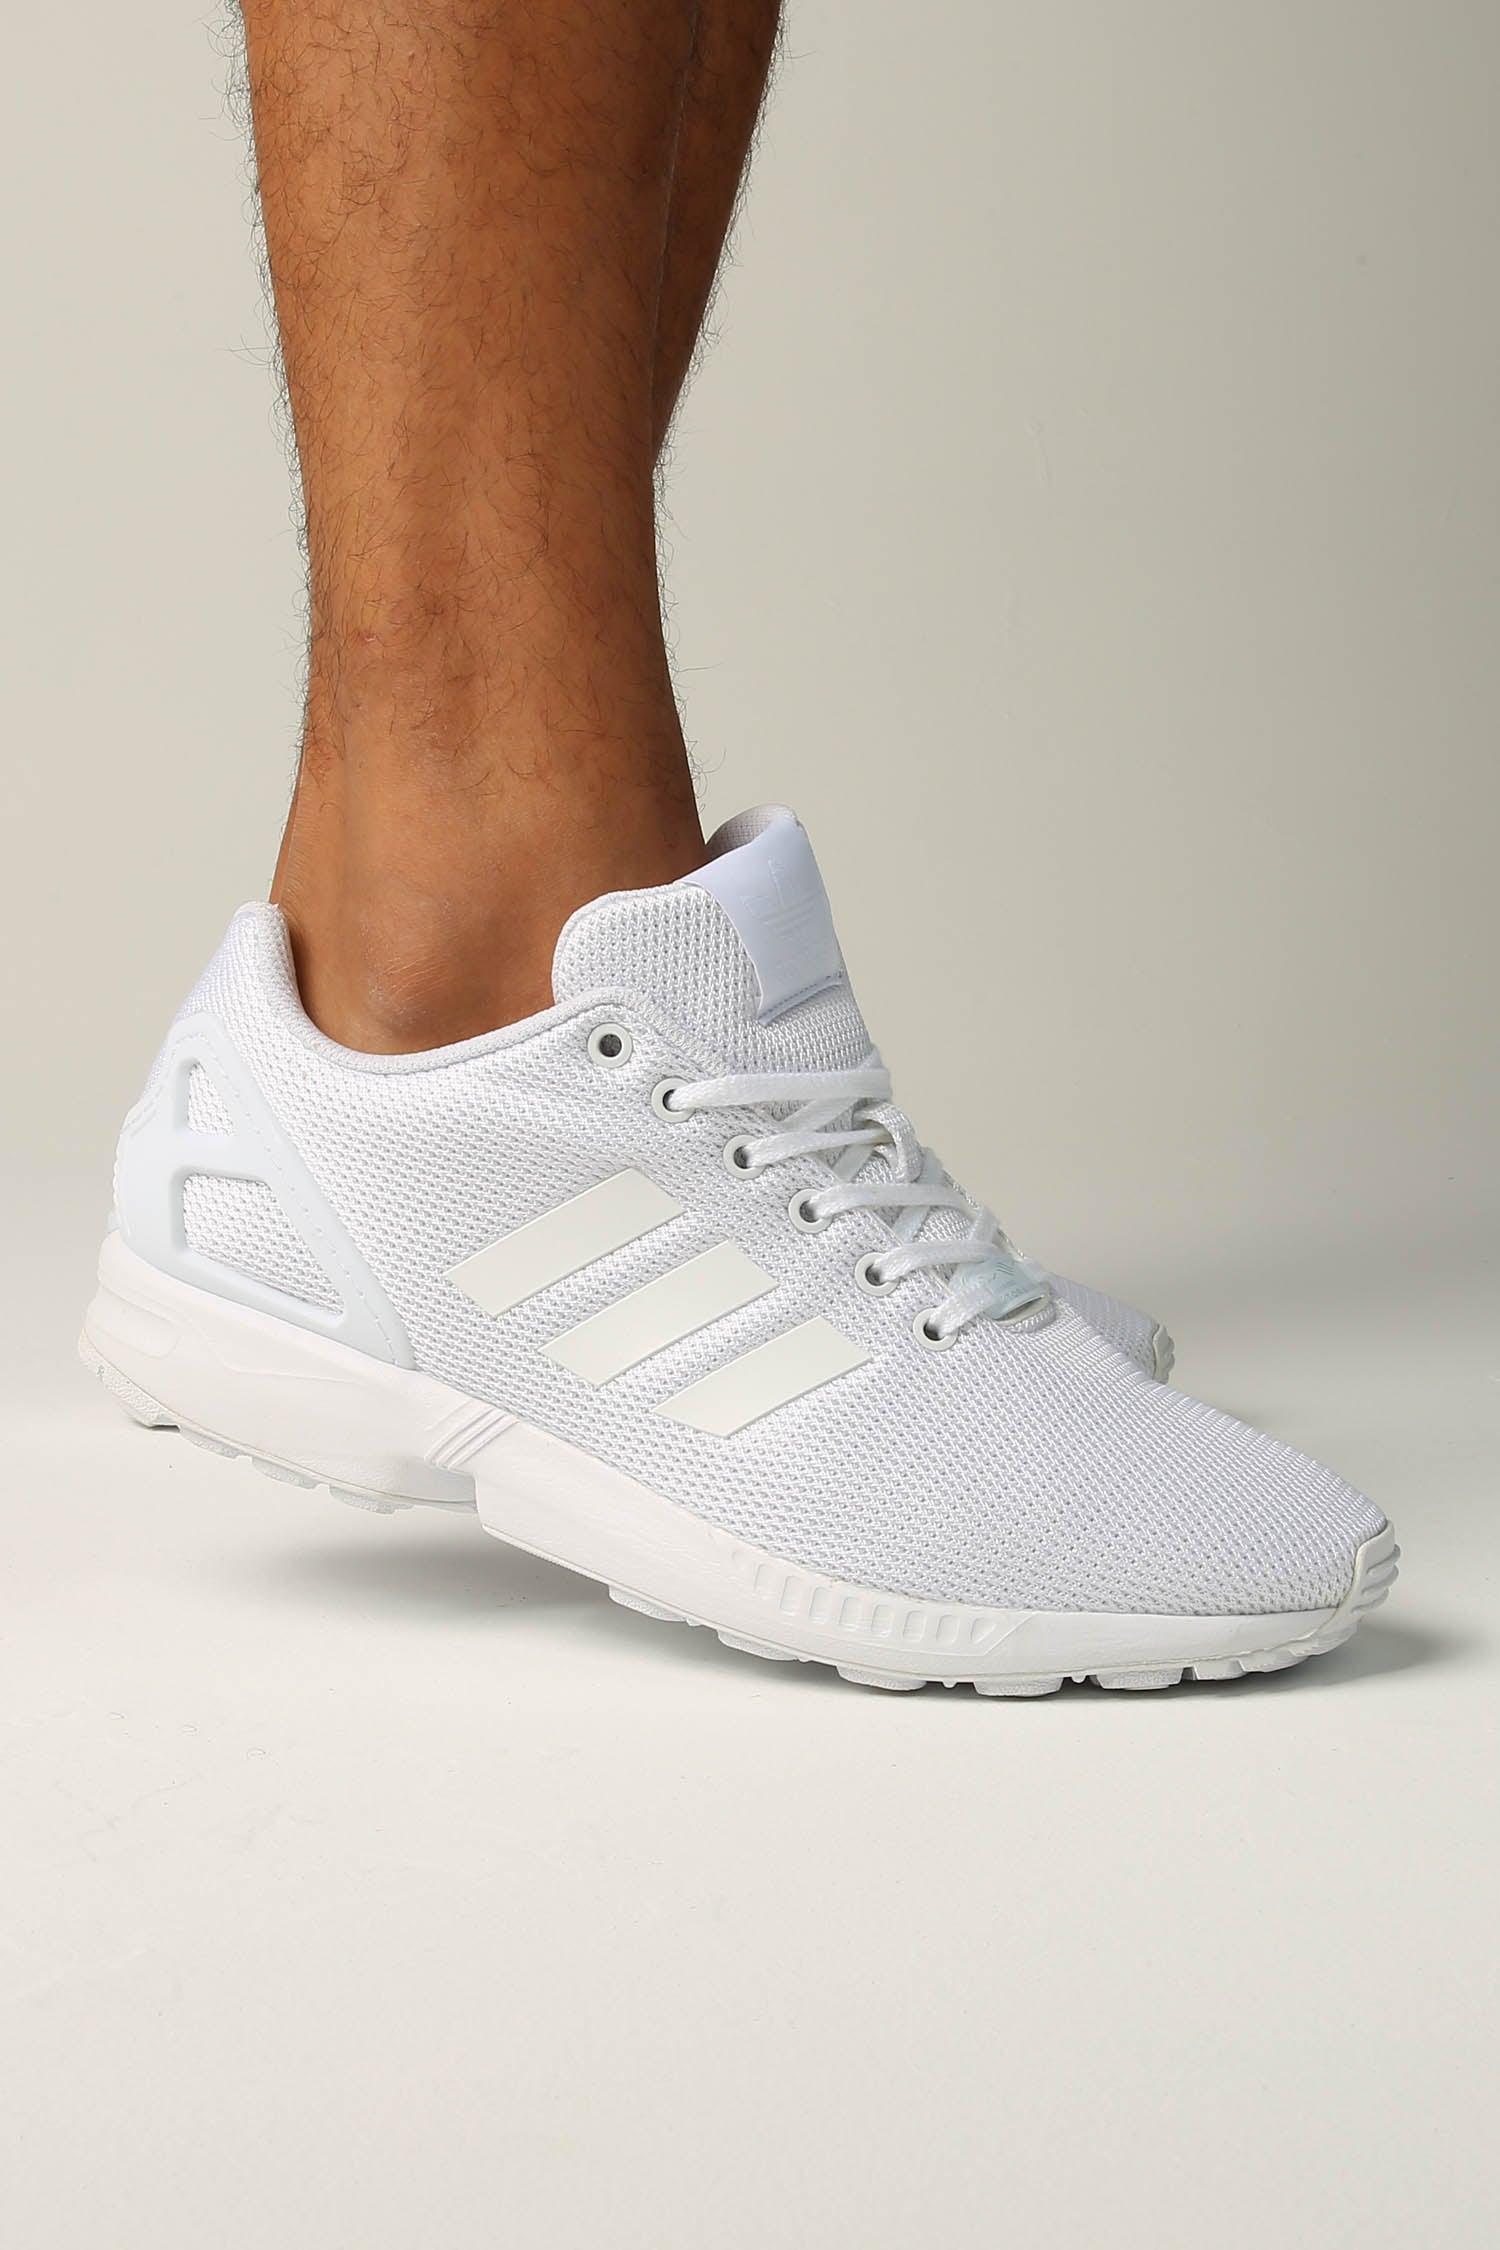 Adidas ZX Flux White with Gum Bottom